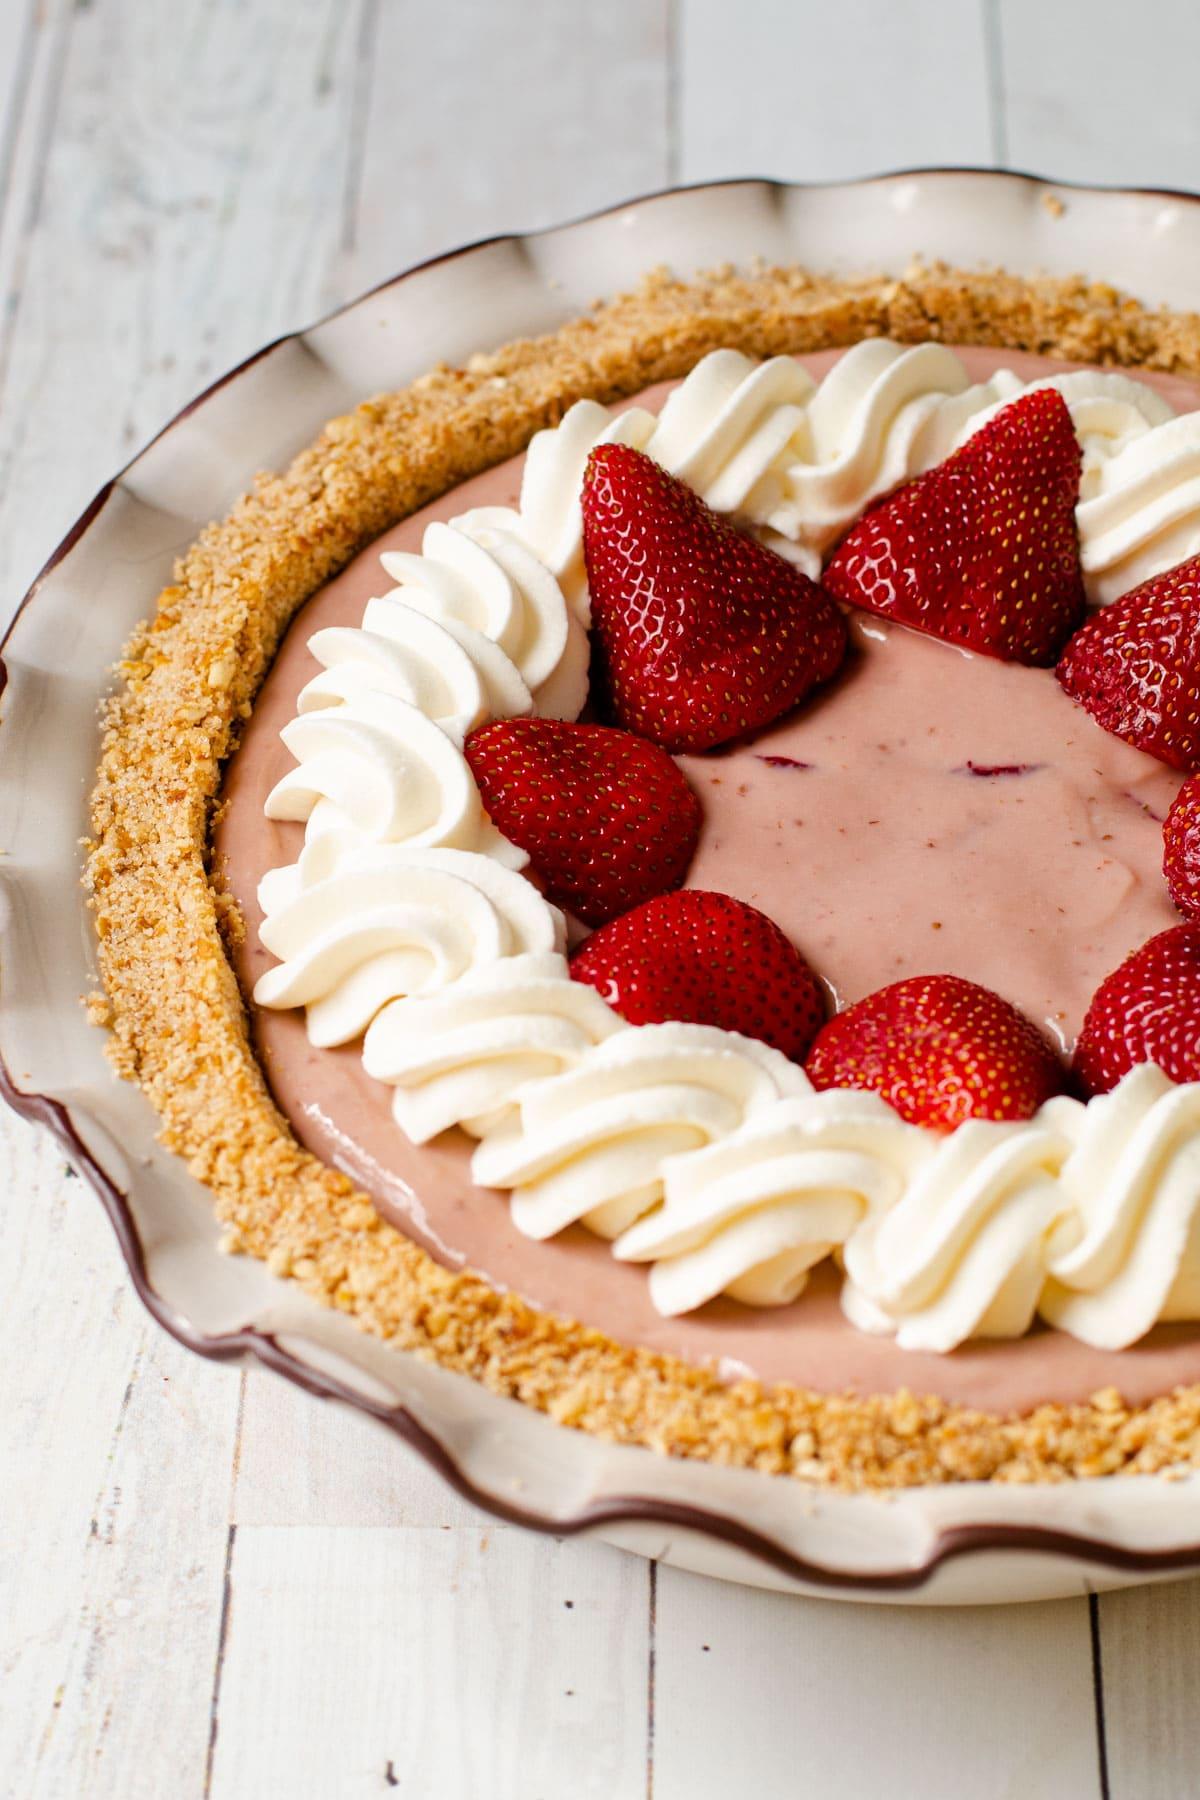 Pretzel pie crust with a pie in it.